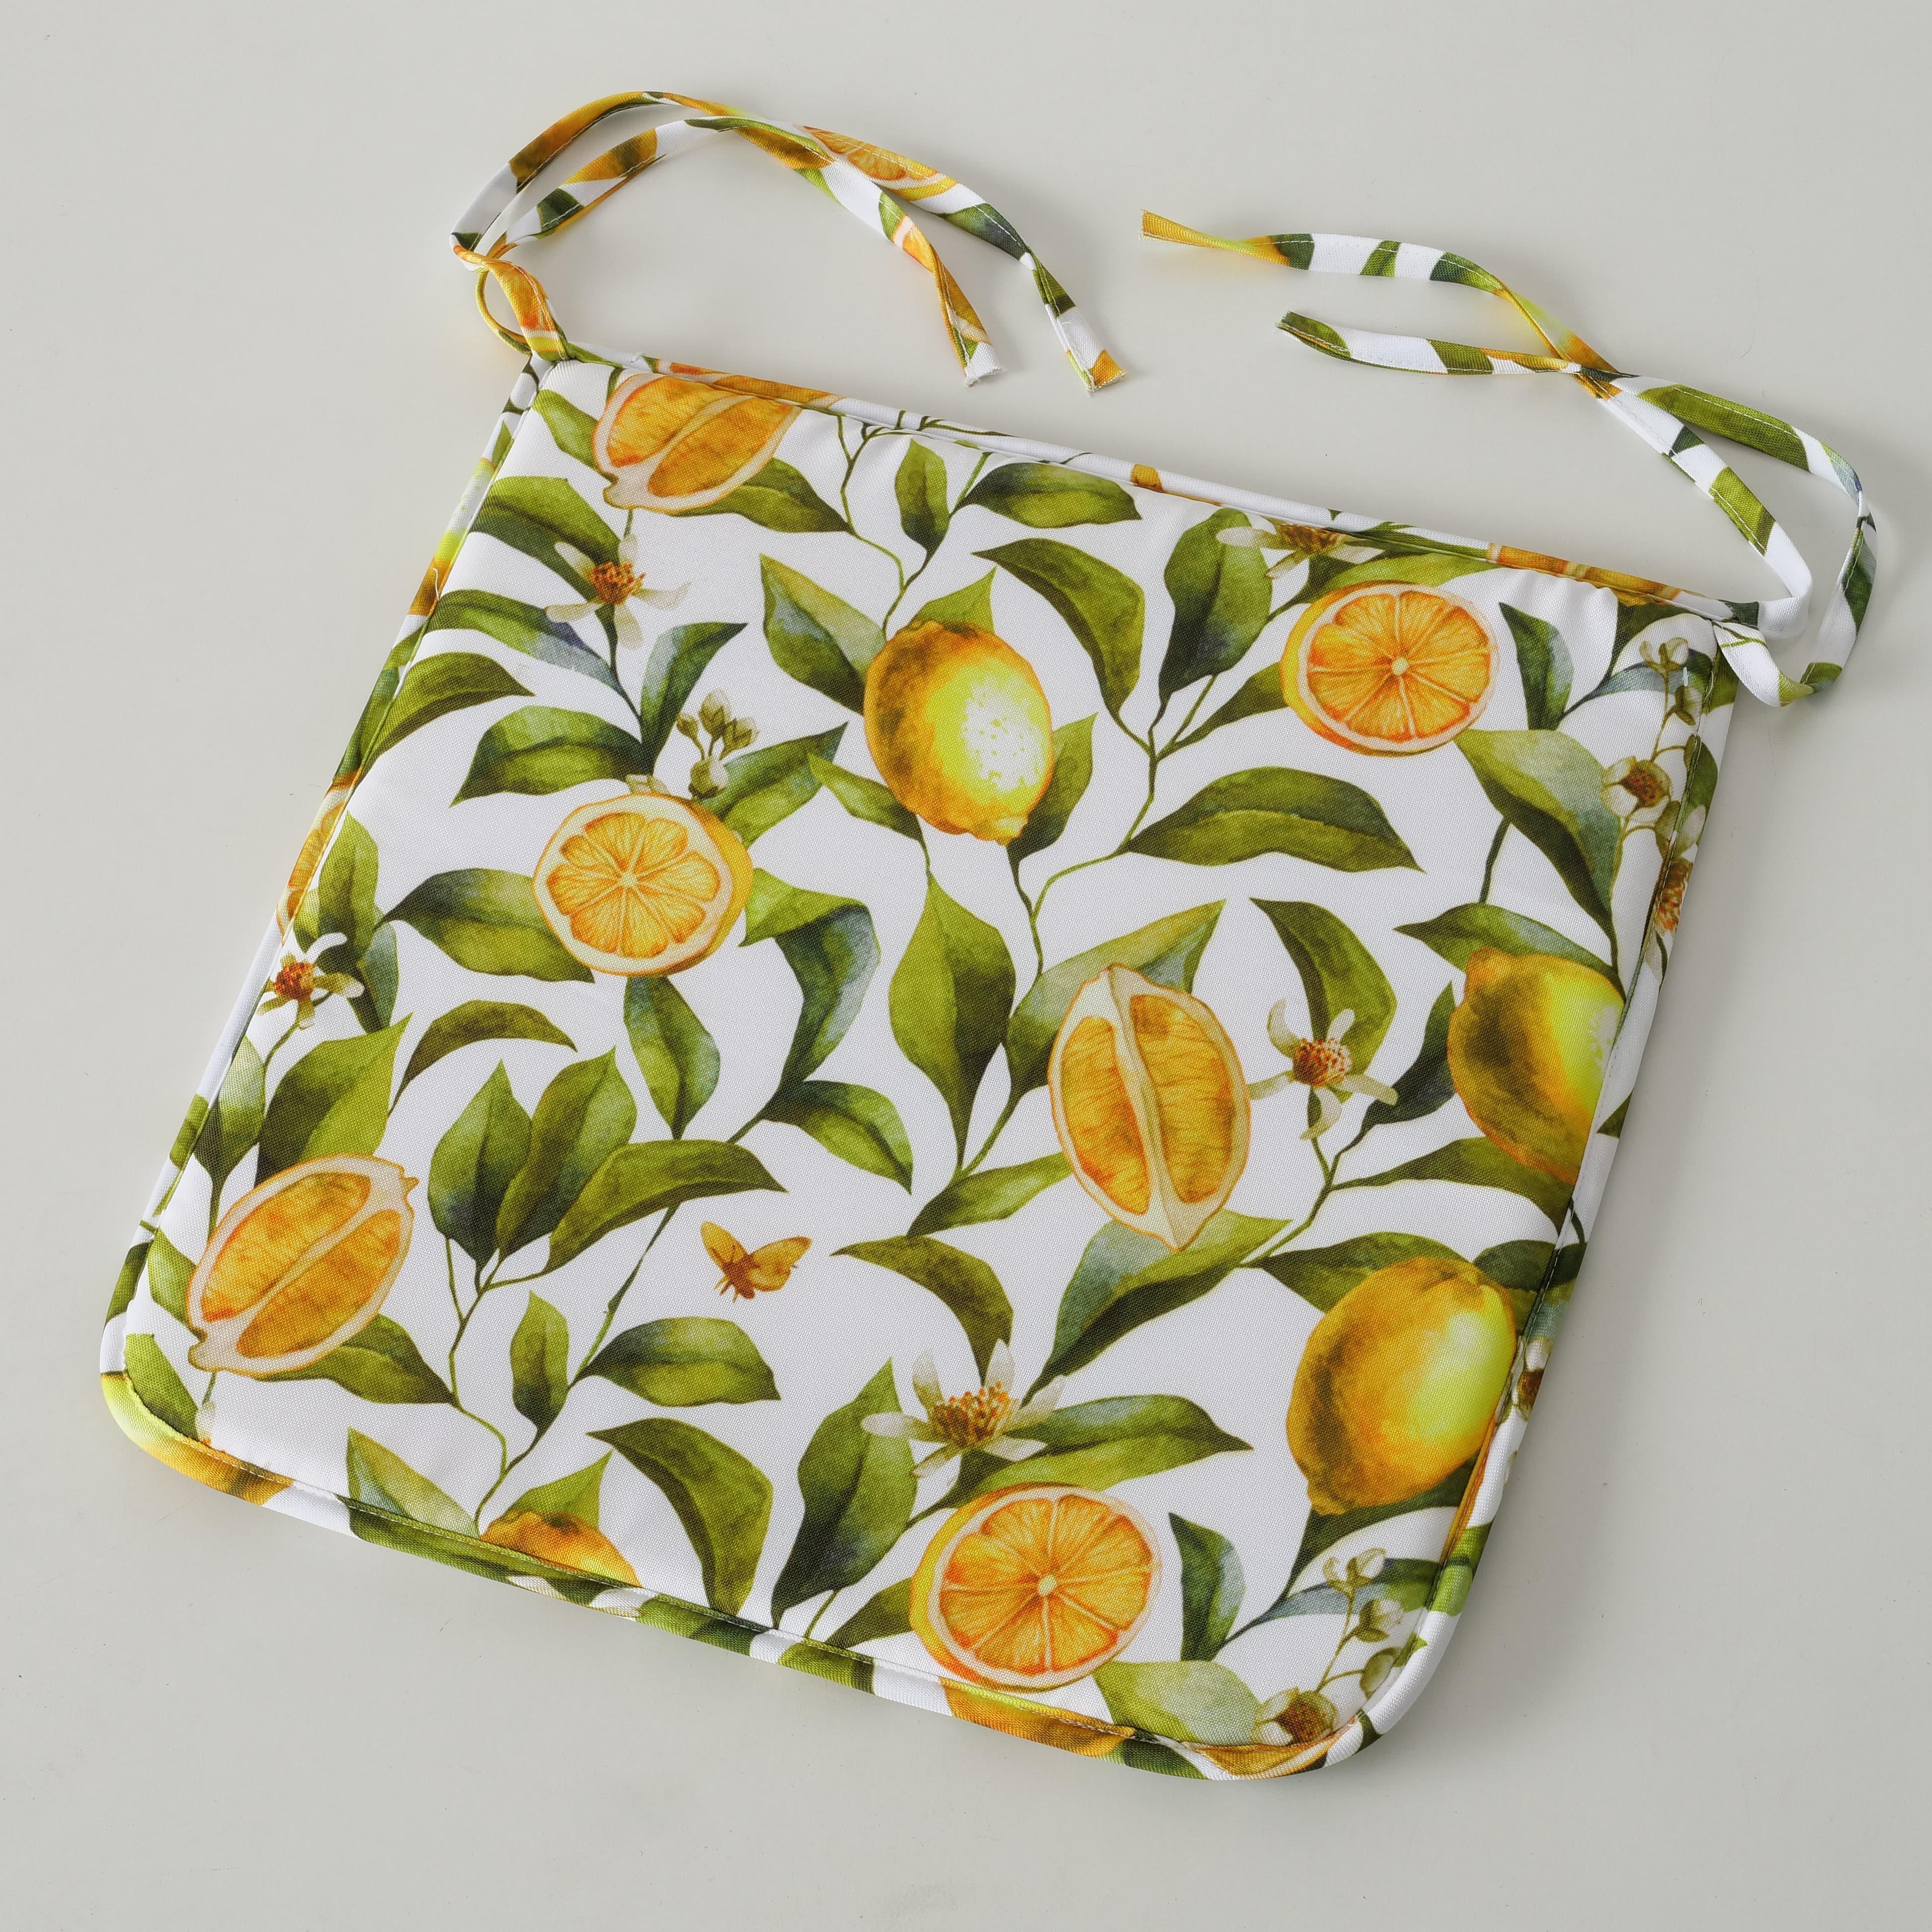 Perna de sezut decorativa Zitrone Multicolor, L45xl45 cm poza